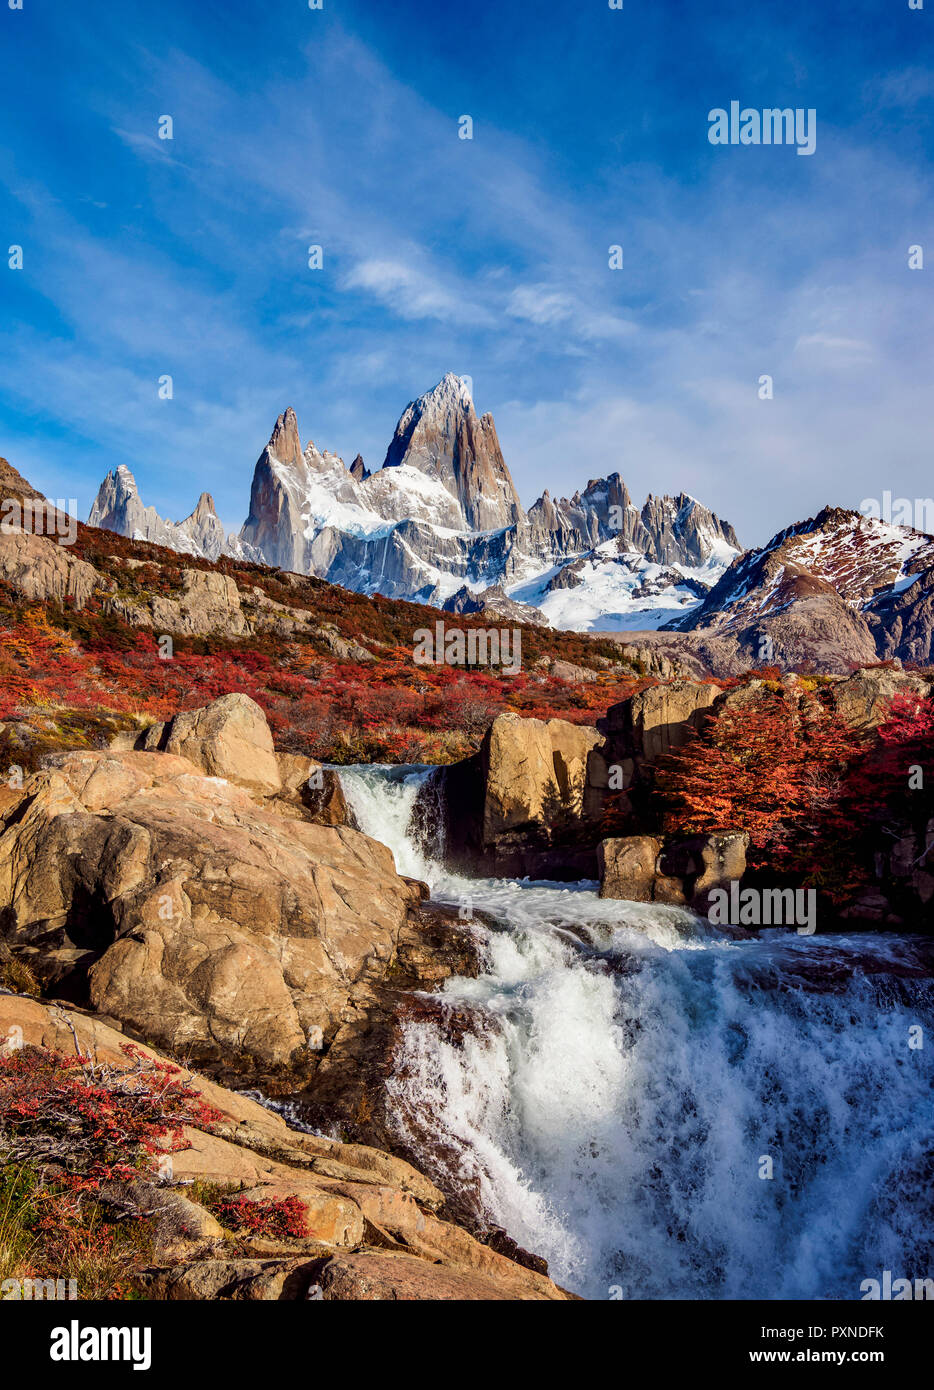 Waterfall on Arroyo del Salto and Mount Fitz Roy, Los Glaciares National Park, Santa Cruz Province, Patagonia, Argentina - Stock Image